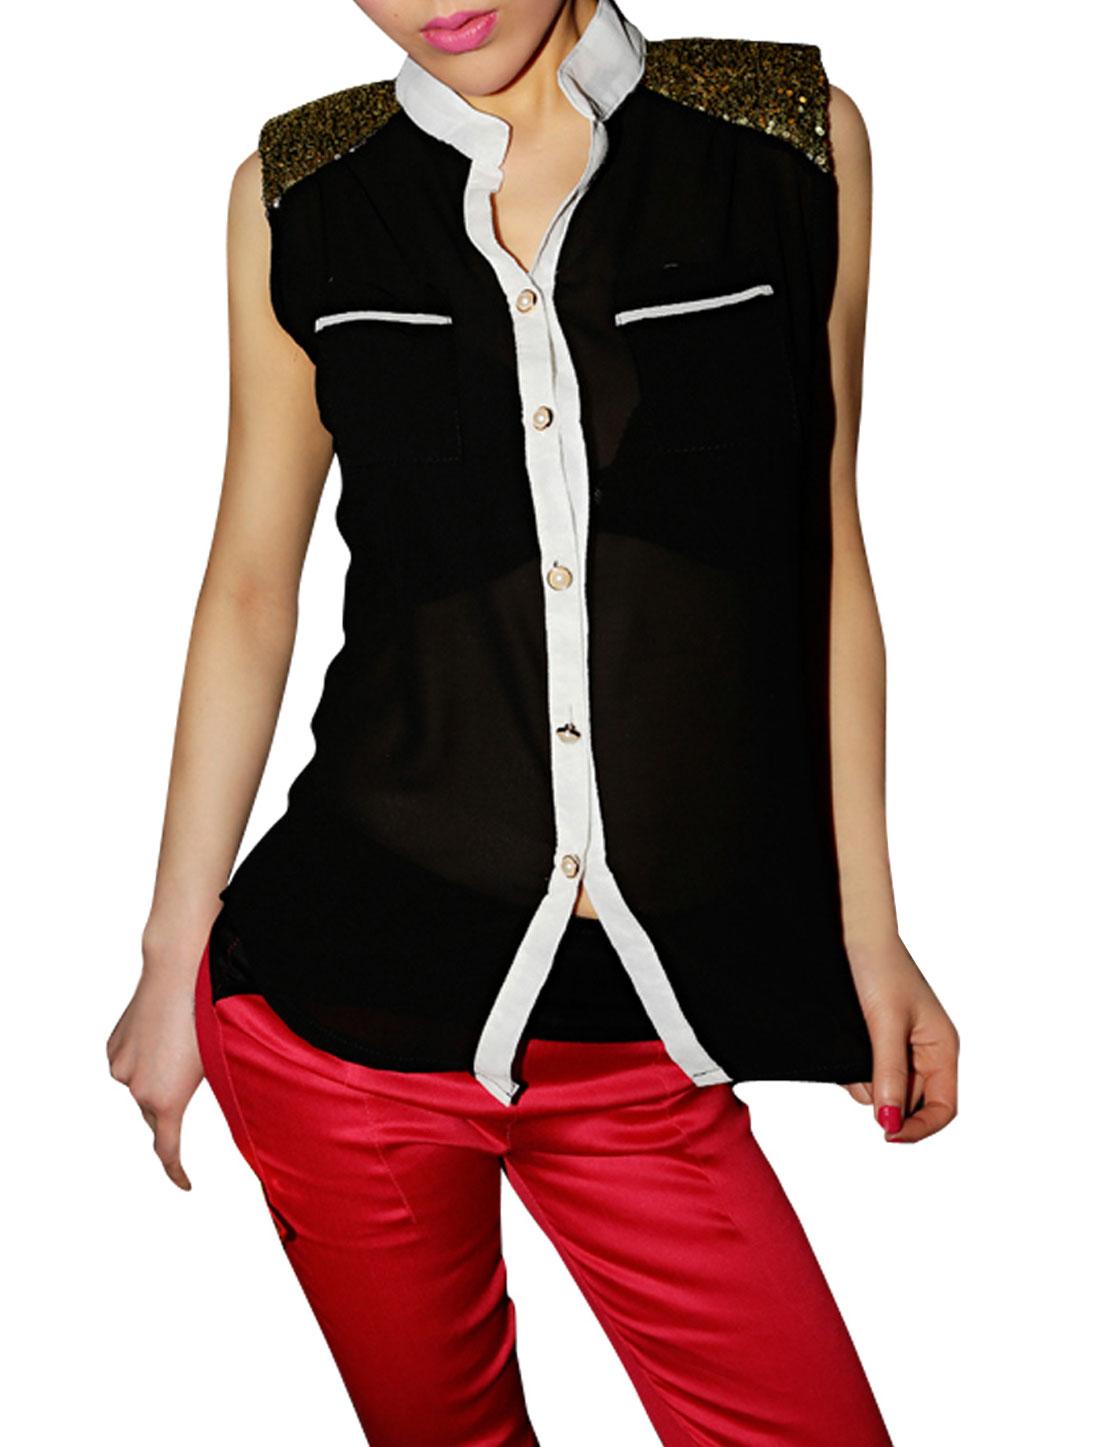 Women Pockets Pailette Decor Single Breasted Tops Blouses Black XS